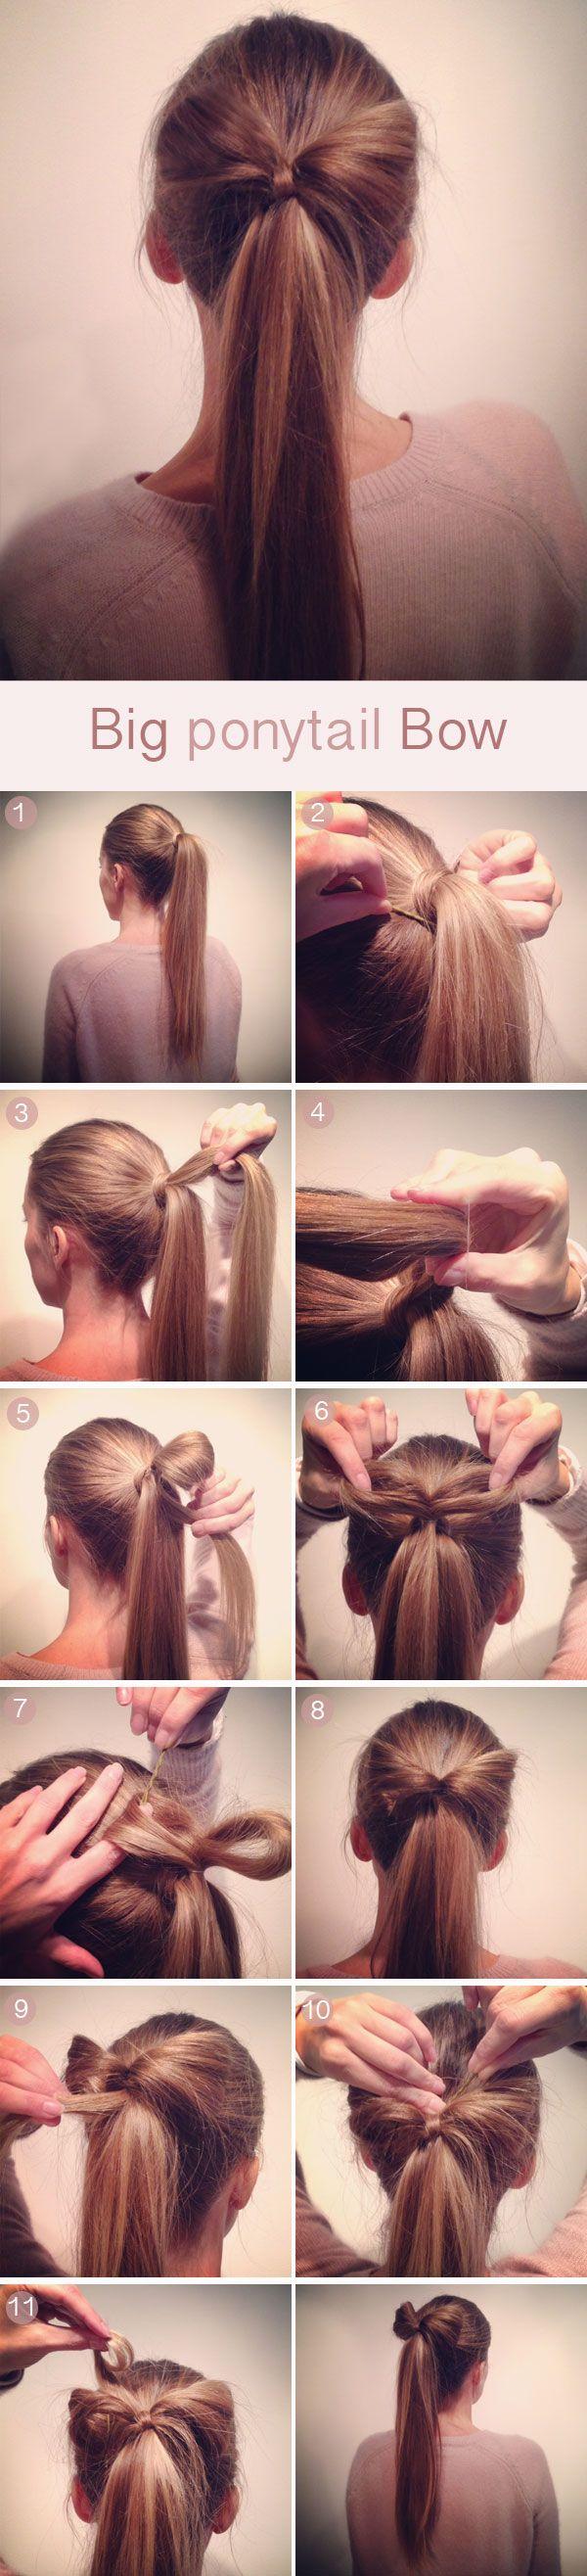 Peinado sencillo, tutorial de coleta con gran lazo